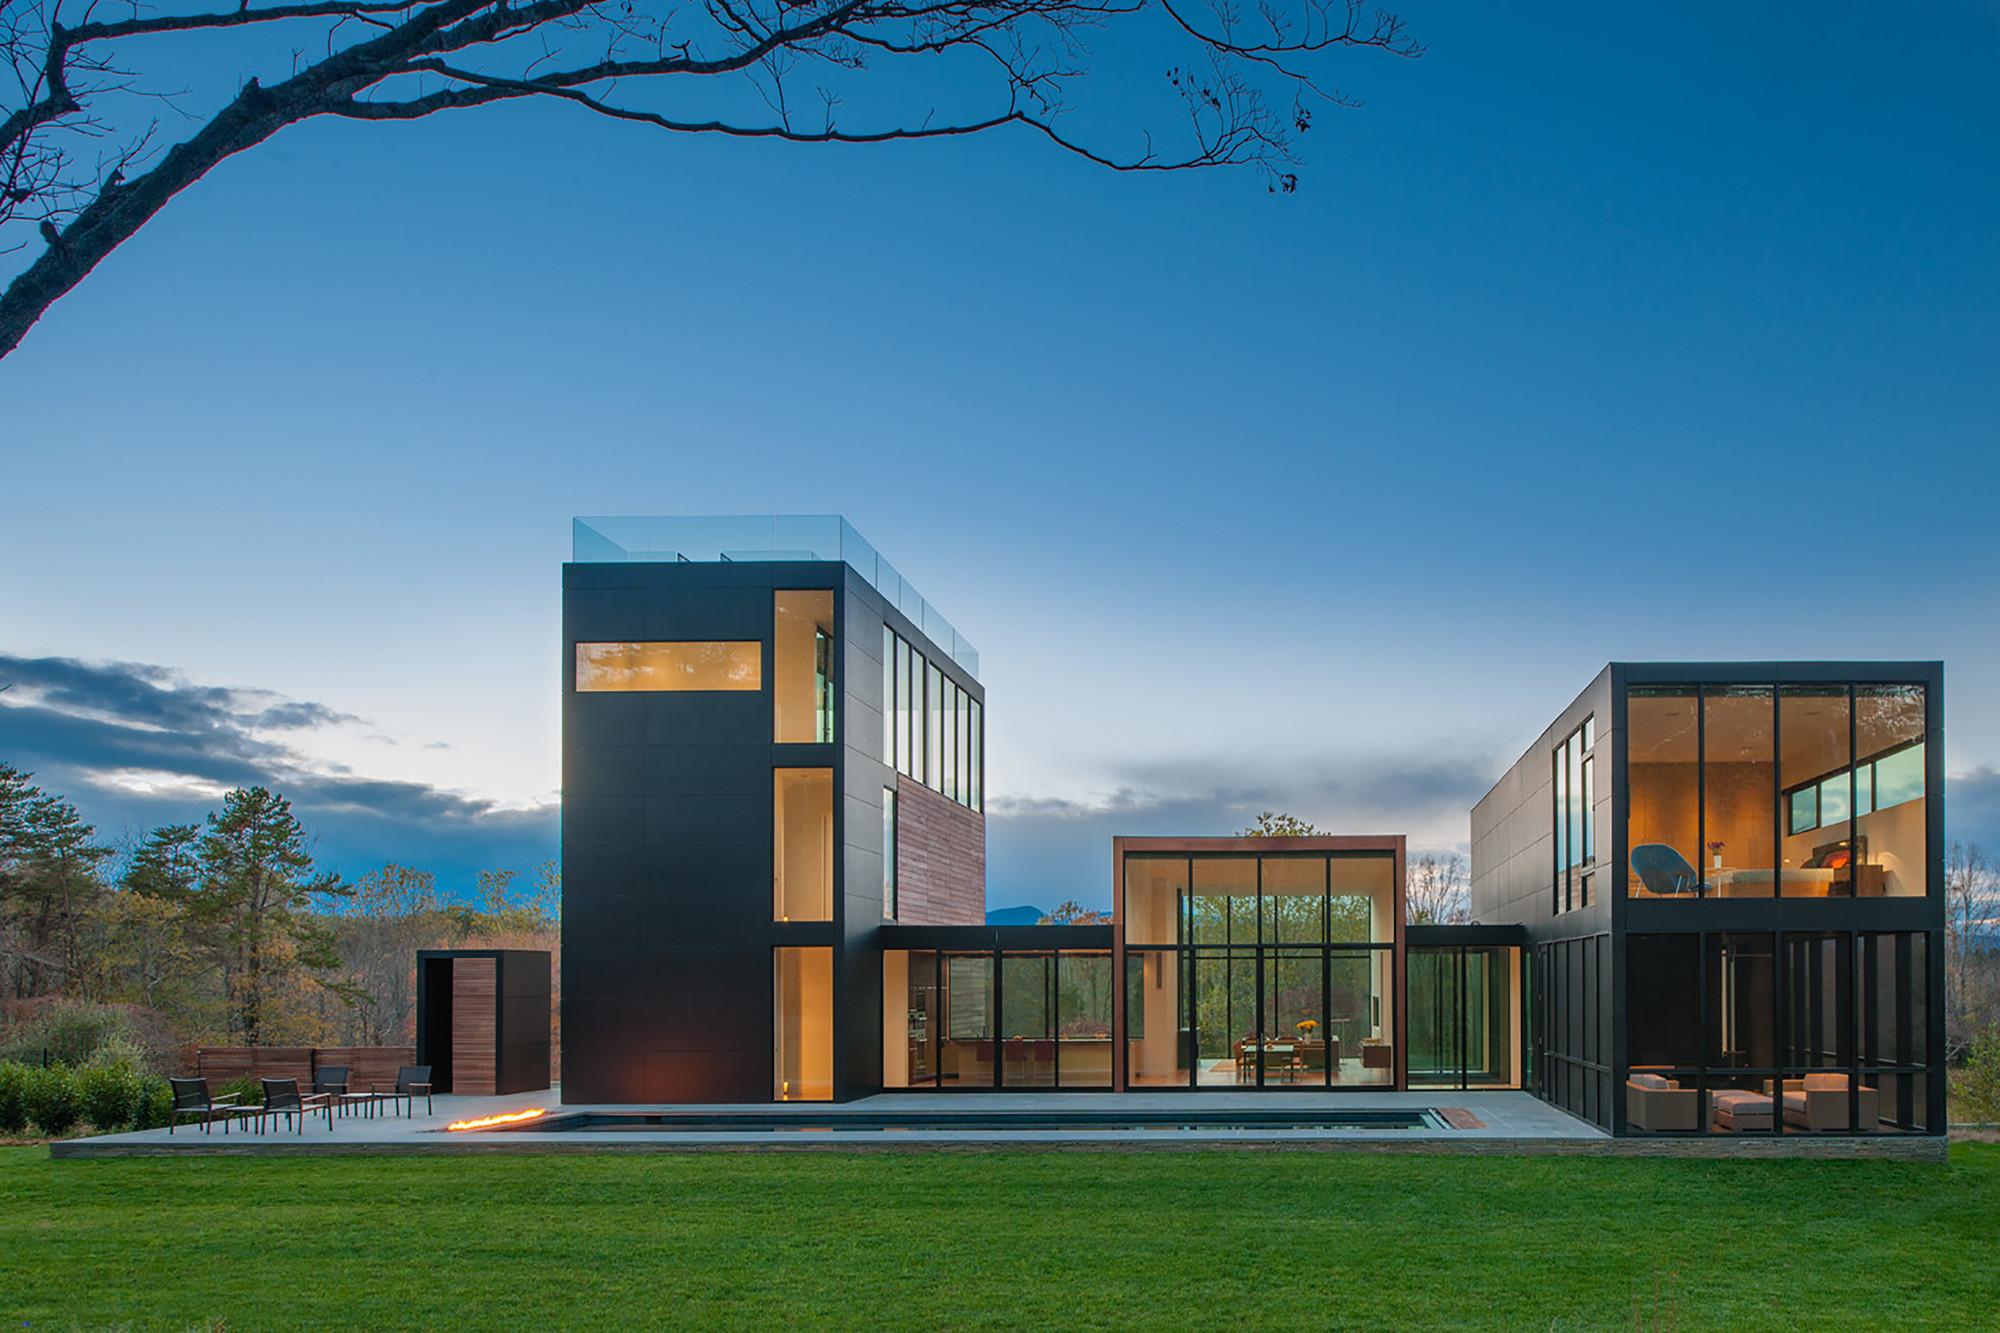 4 Springs Lane / Robert M. Gurney Architect,  Maxwell MacKenzie